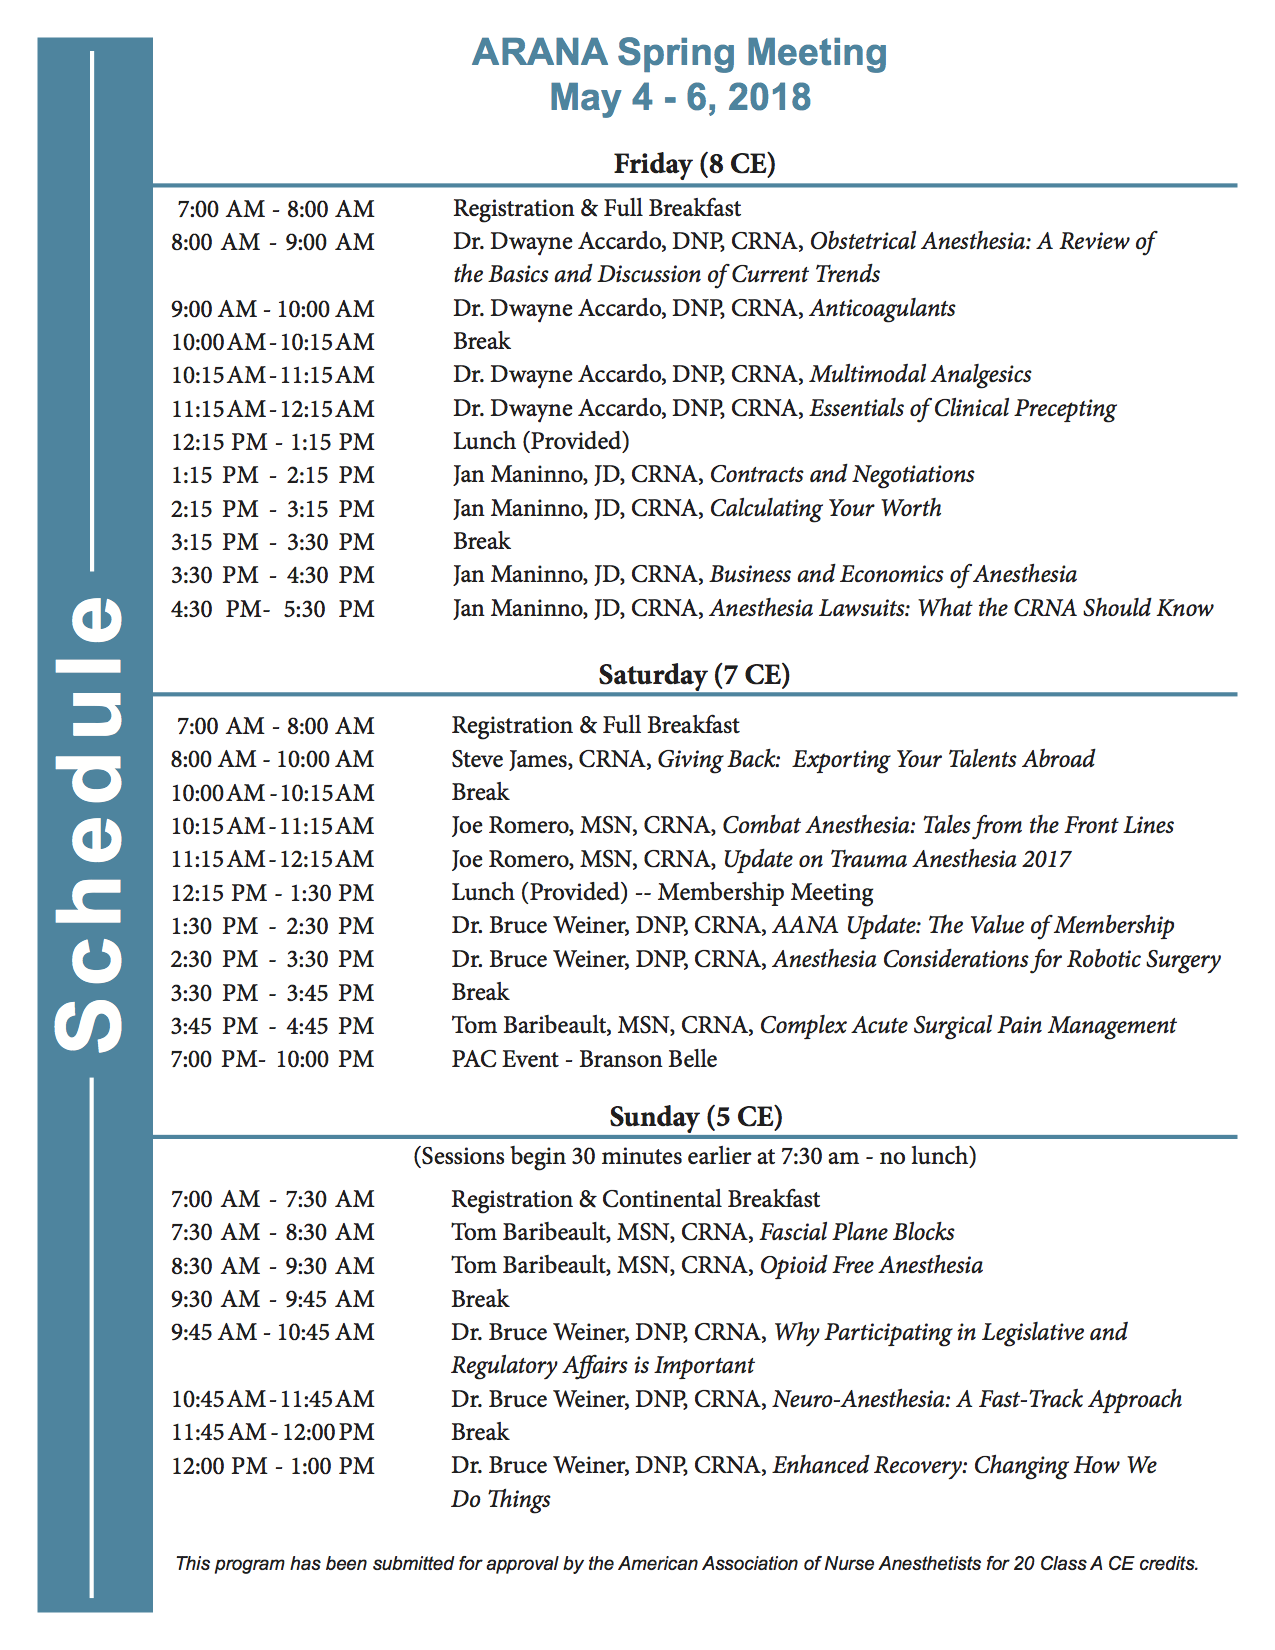 ARANA Spring Meeting - Branson map pdf